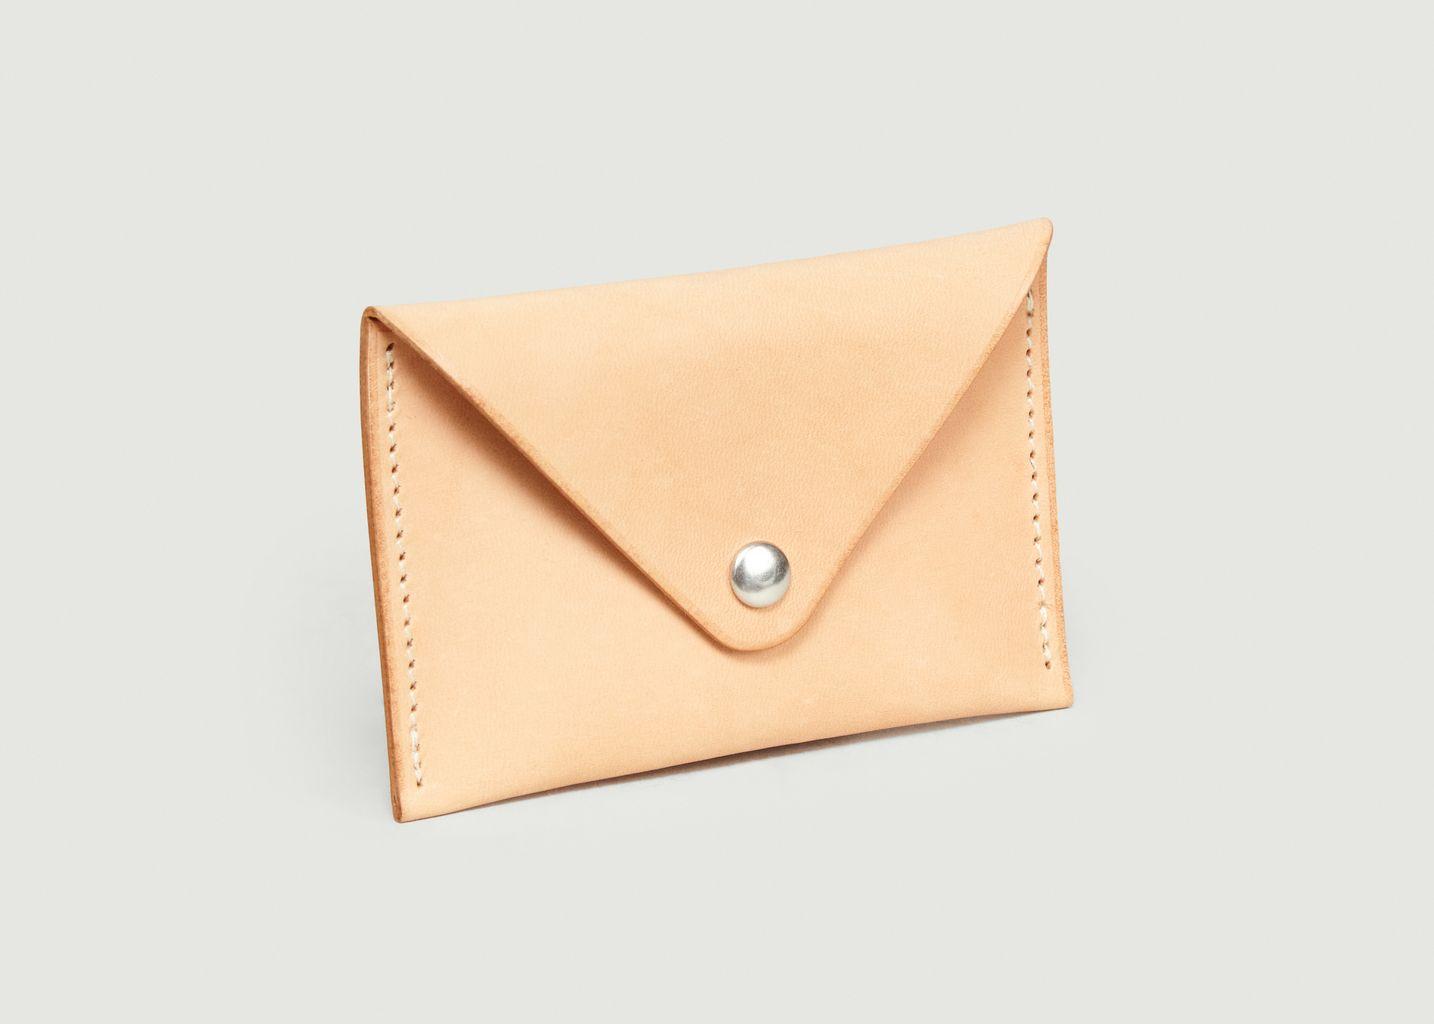 Porte-Cartes Enveloppe - Laperruque